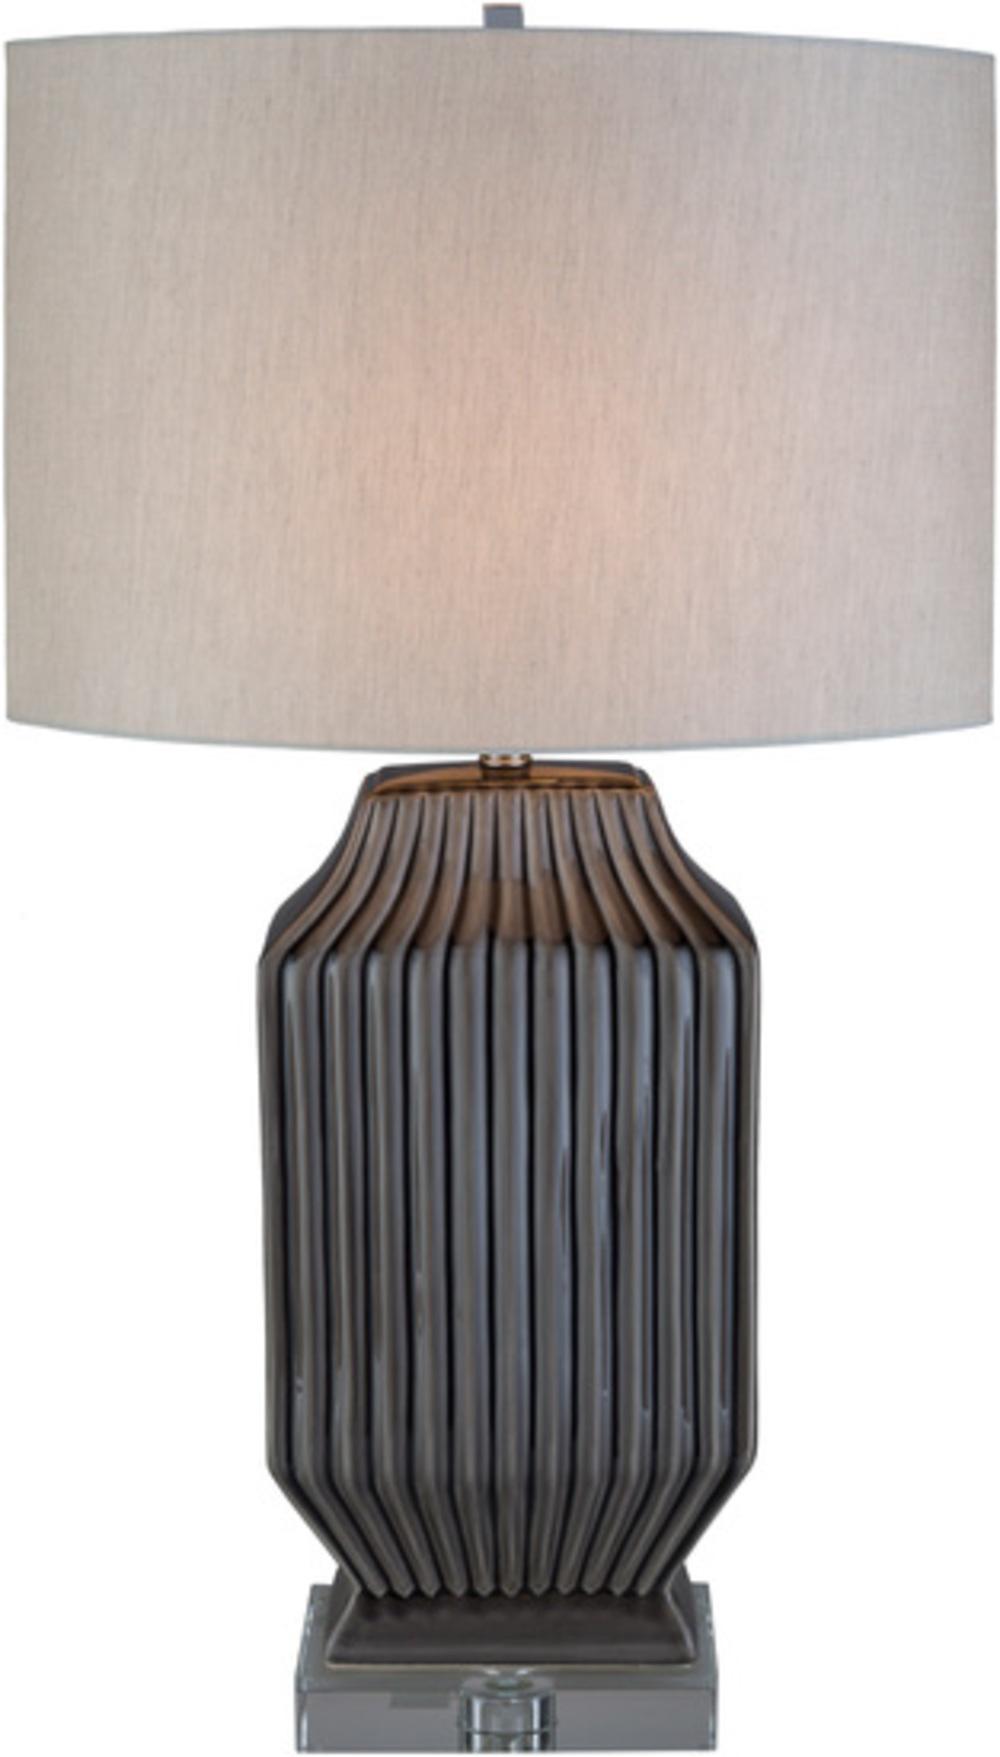 Surya - Blacklake Table Lamp